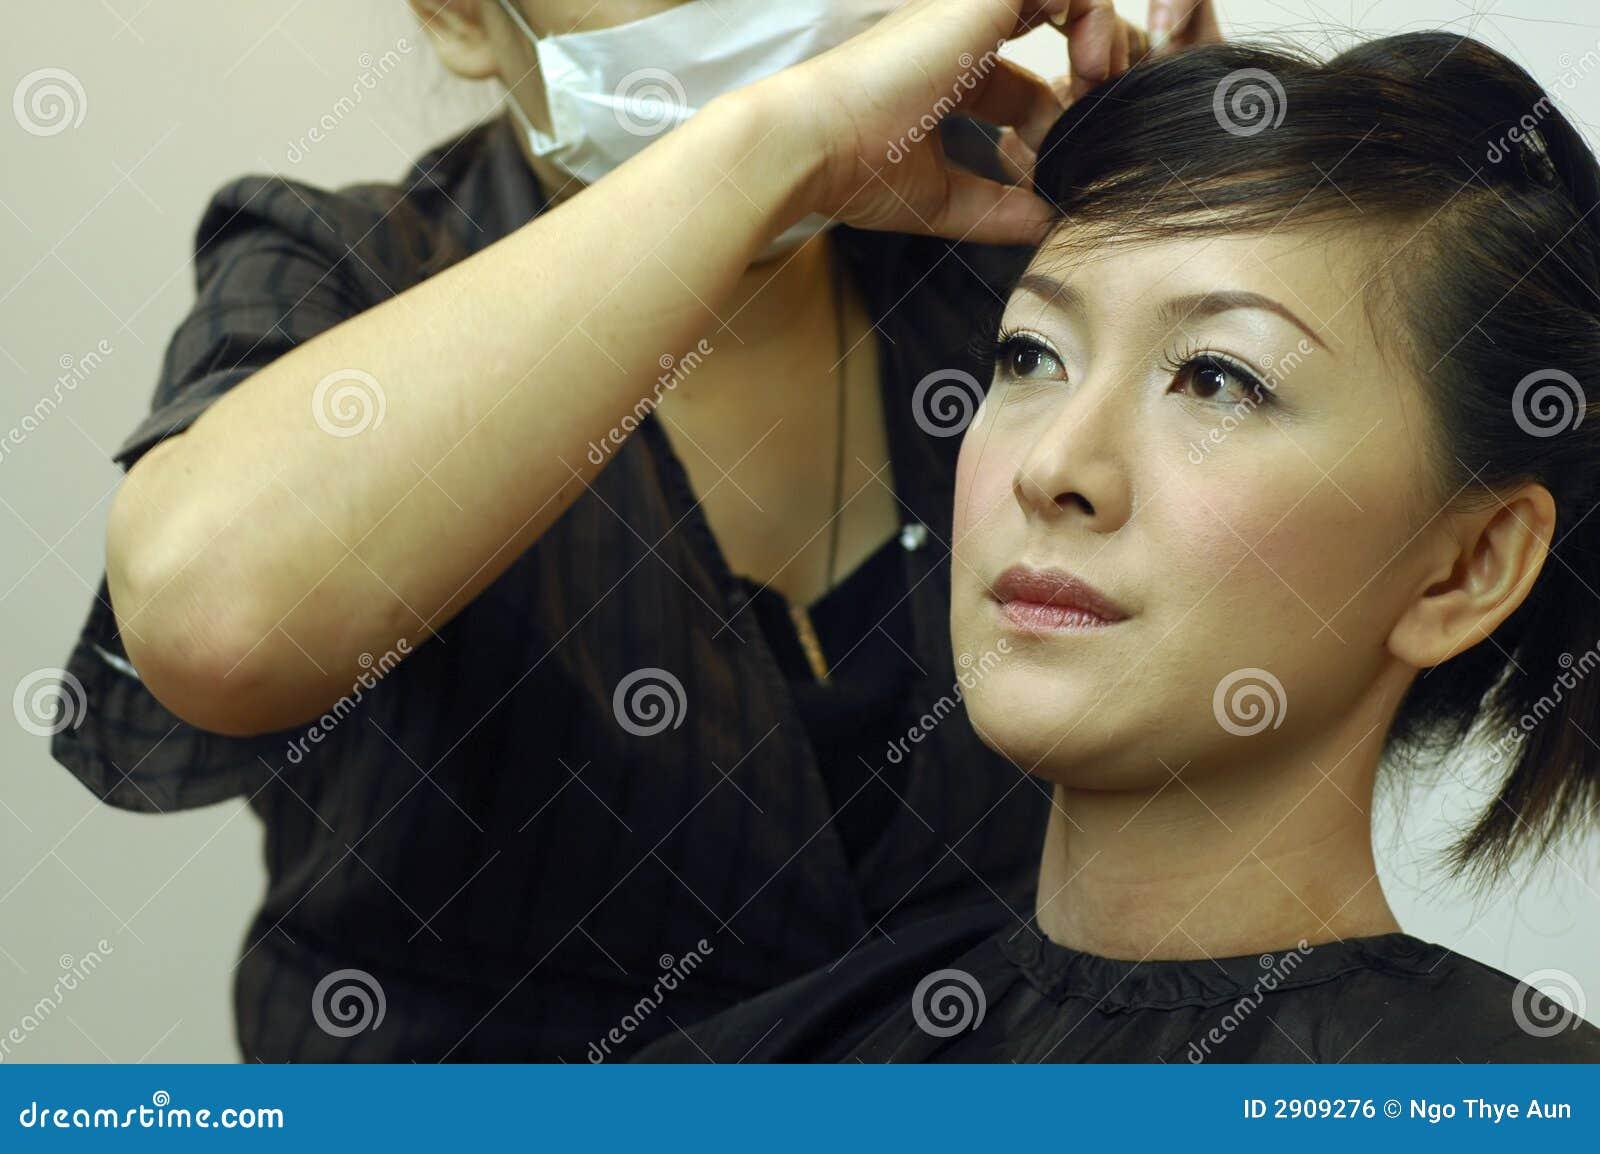 Hair Salon Royalty Free Stock Image - Image: 2909276